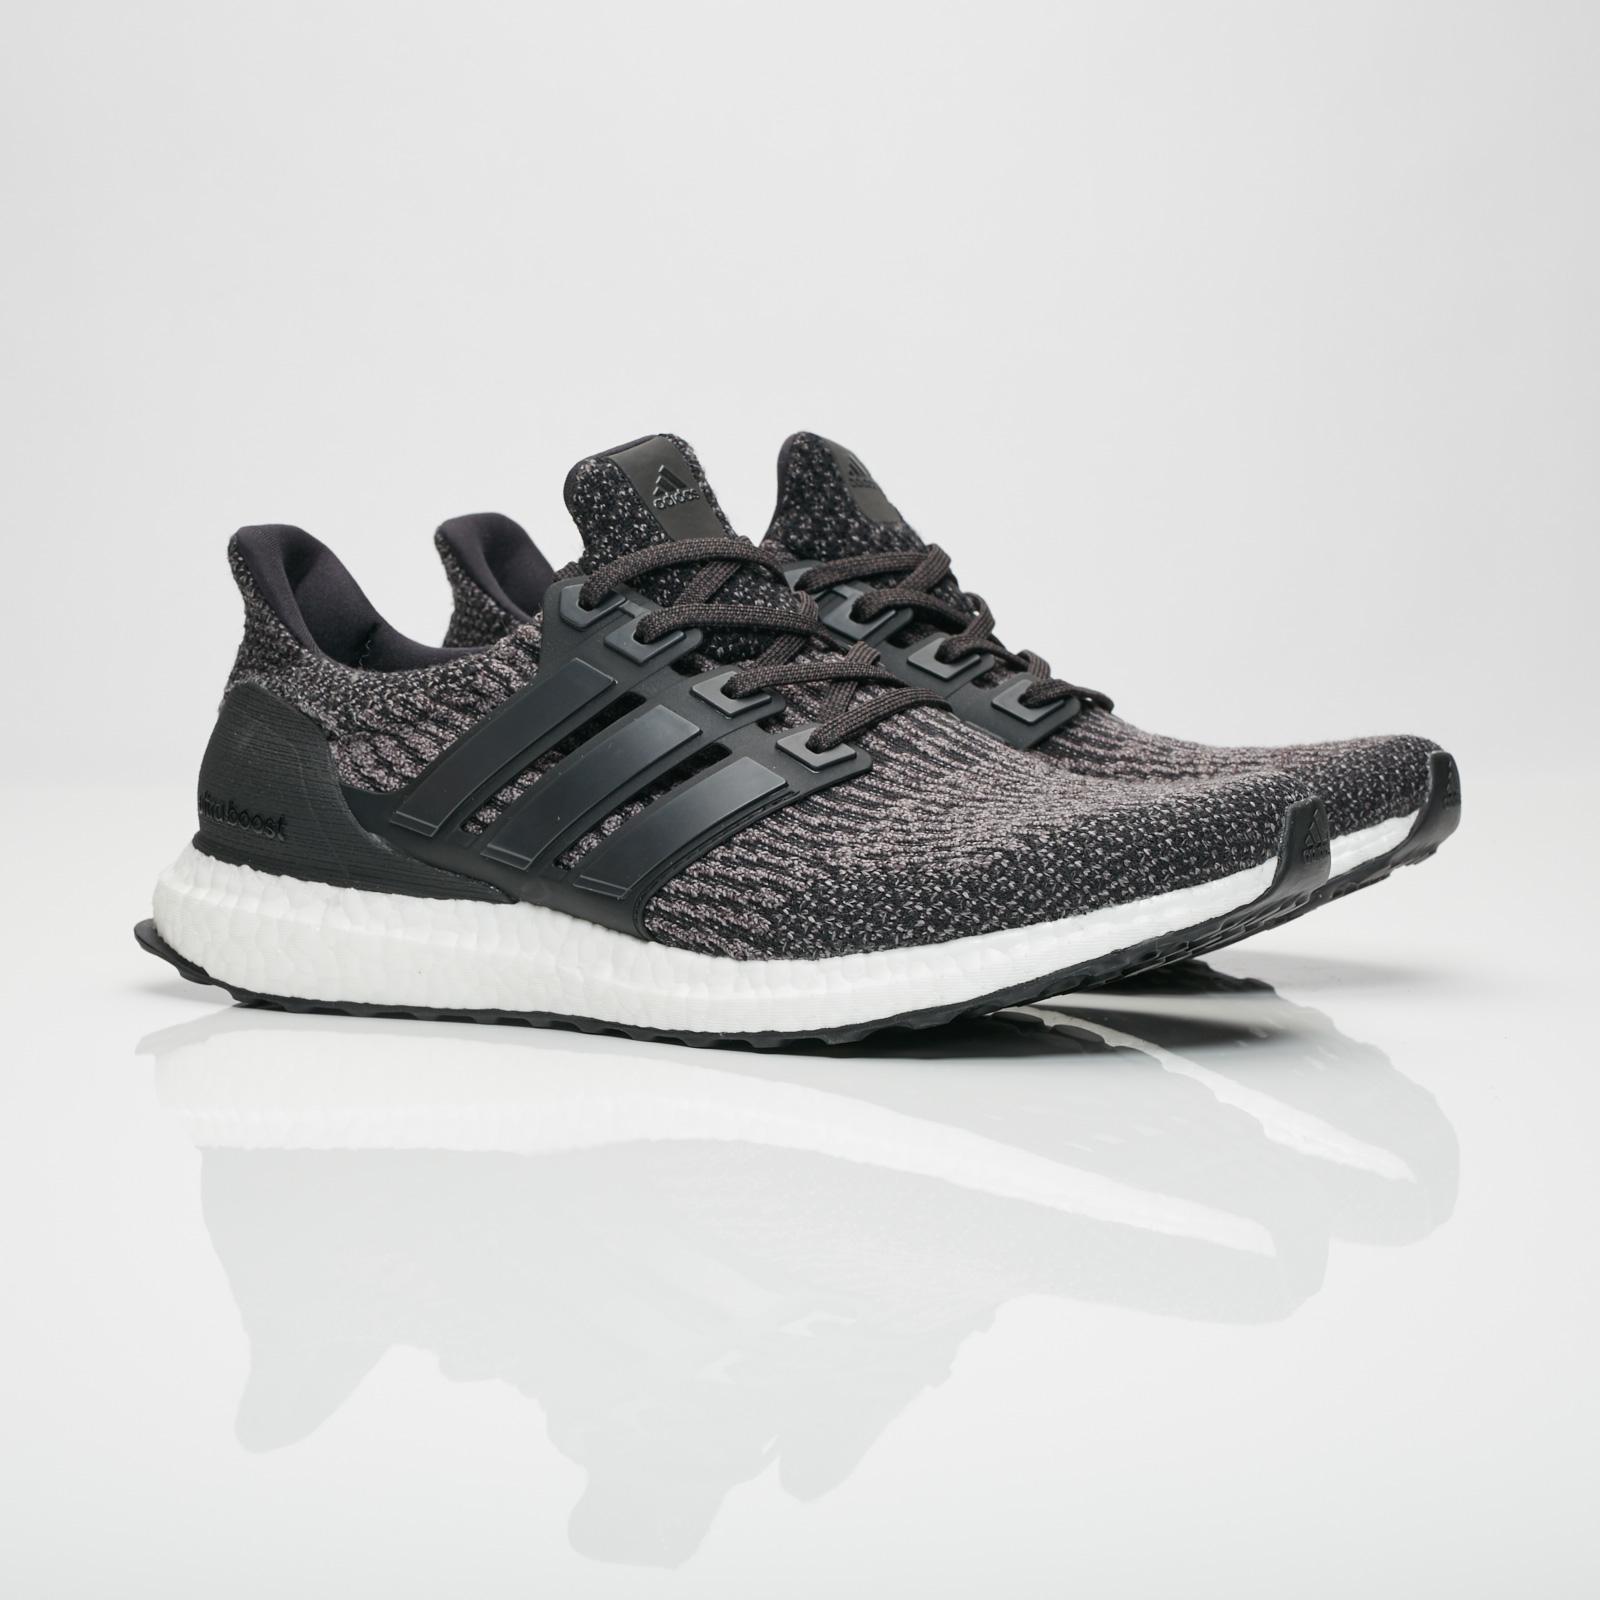 8416217de298e adidas UltraBOOST - S80731 - Sneakersnstuff